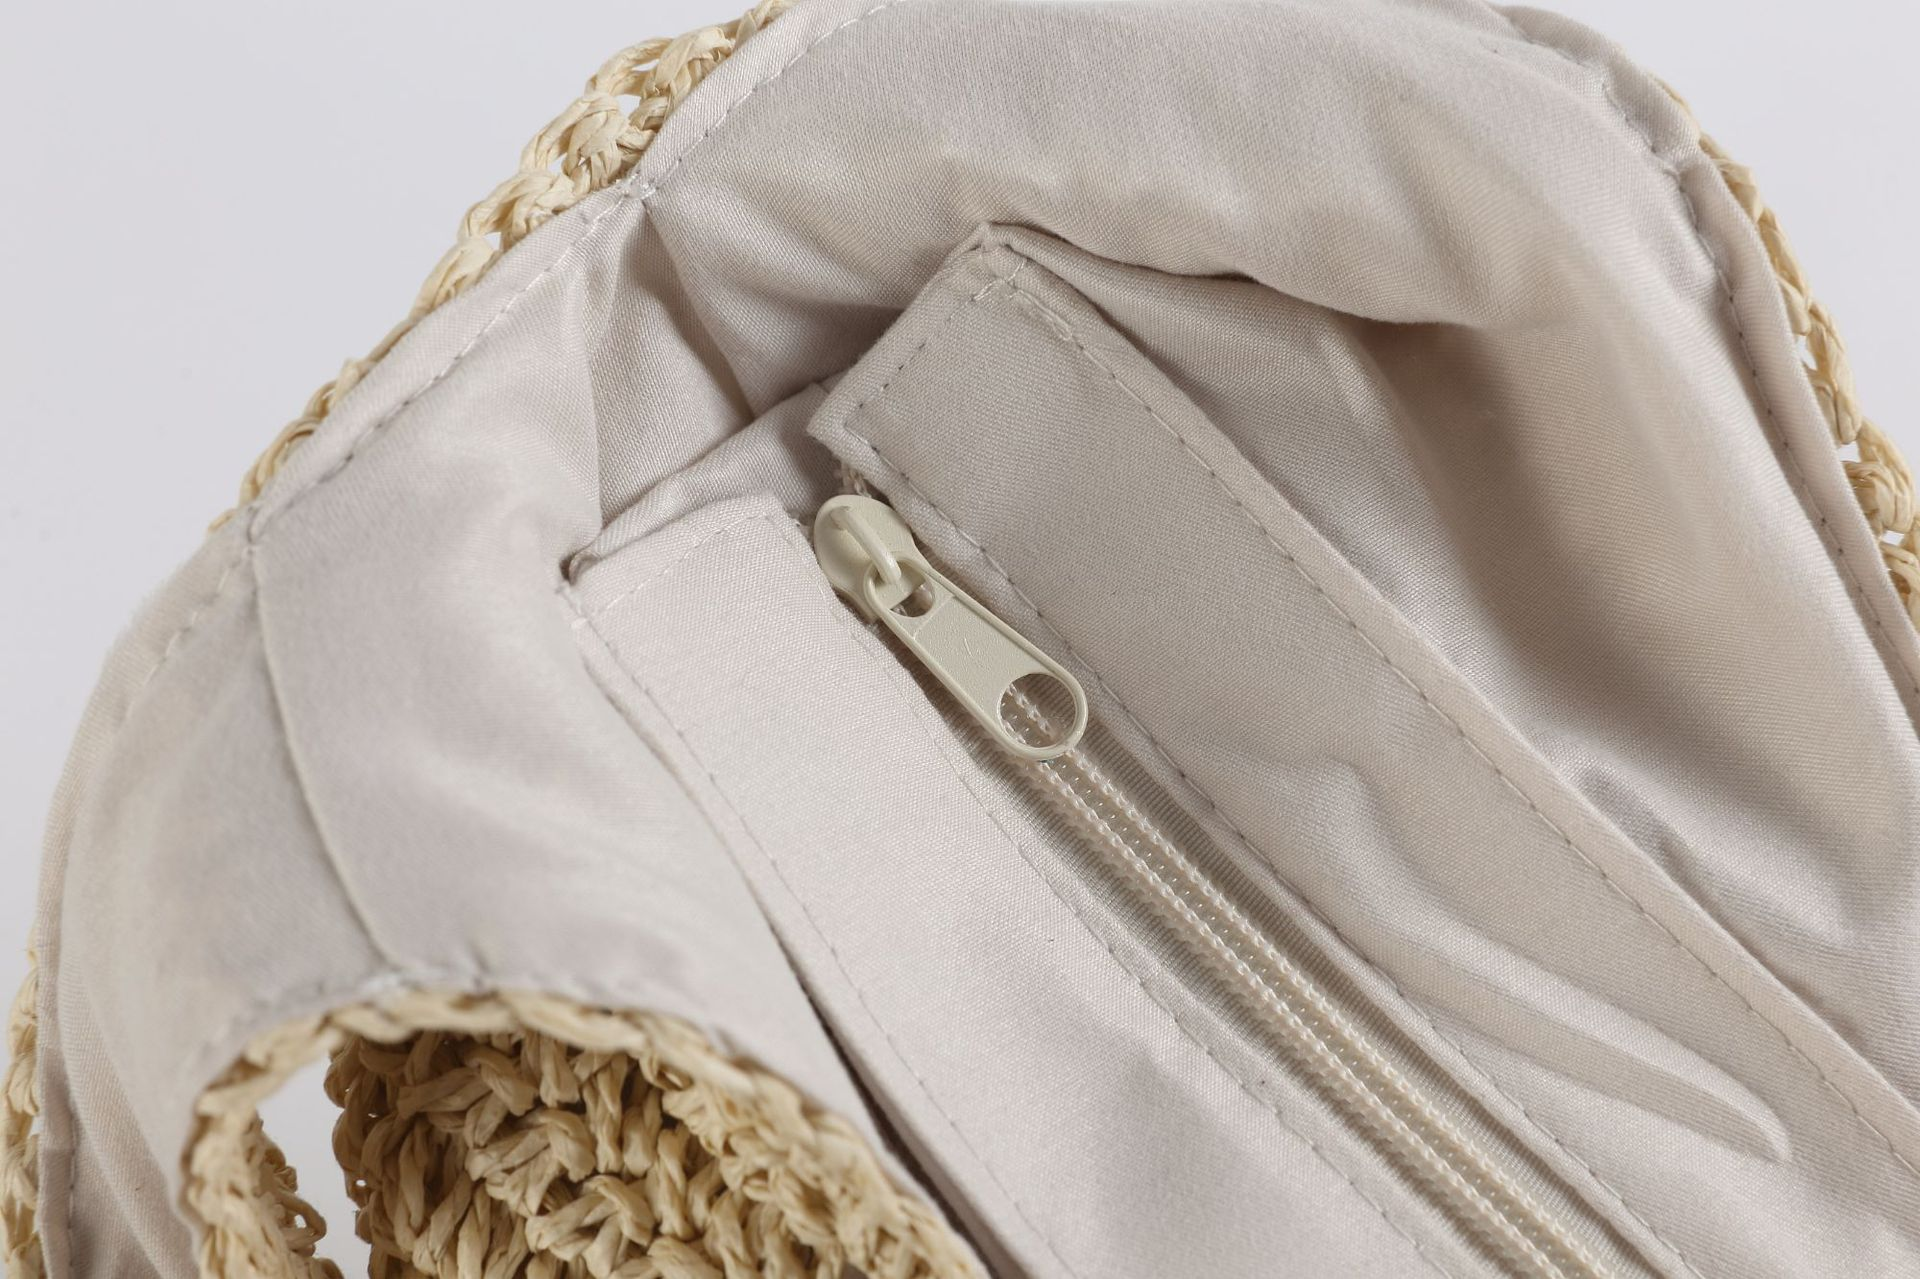 Oversized Straw Shopper Bags